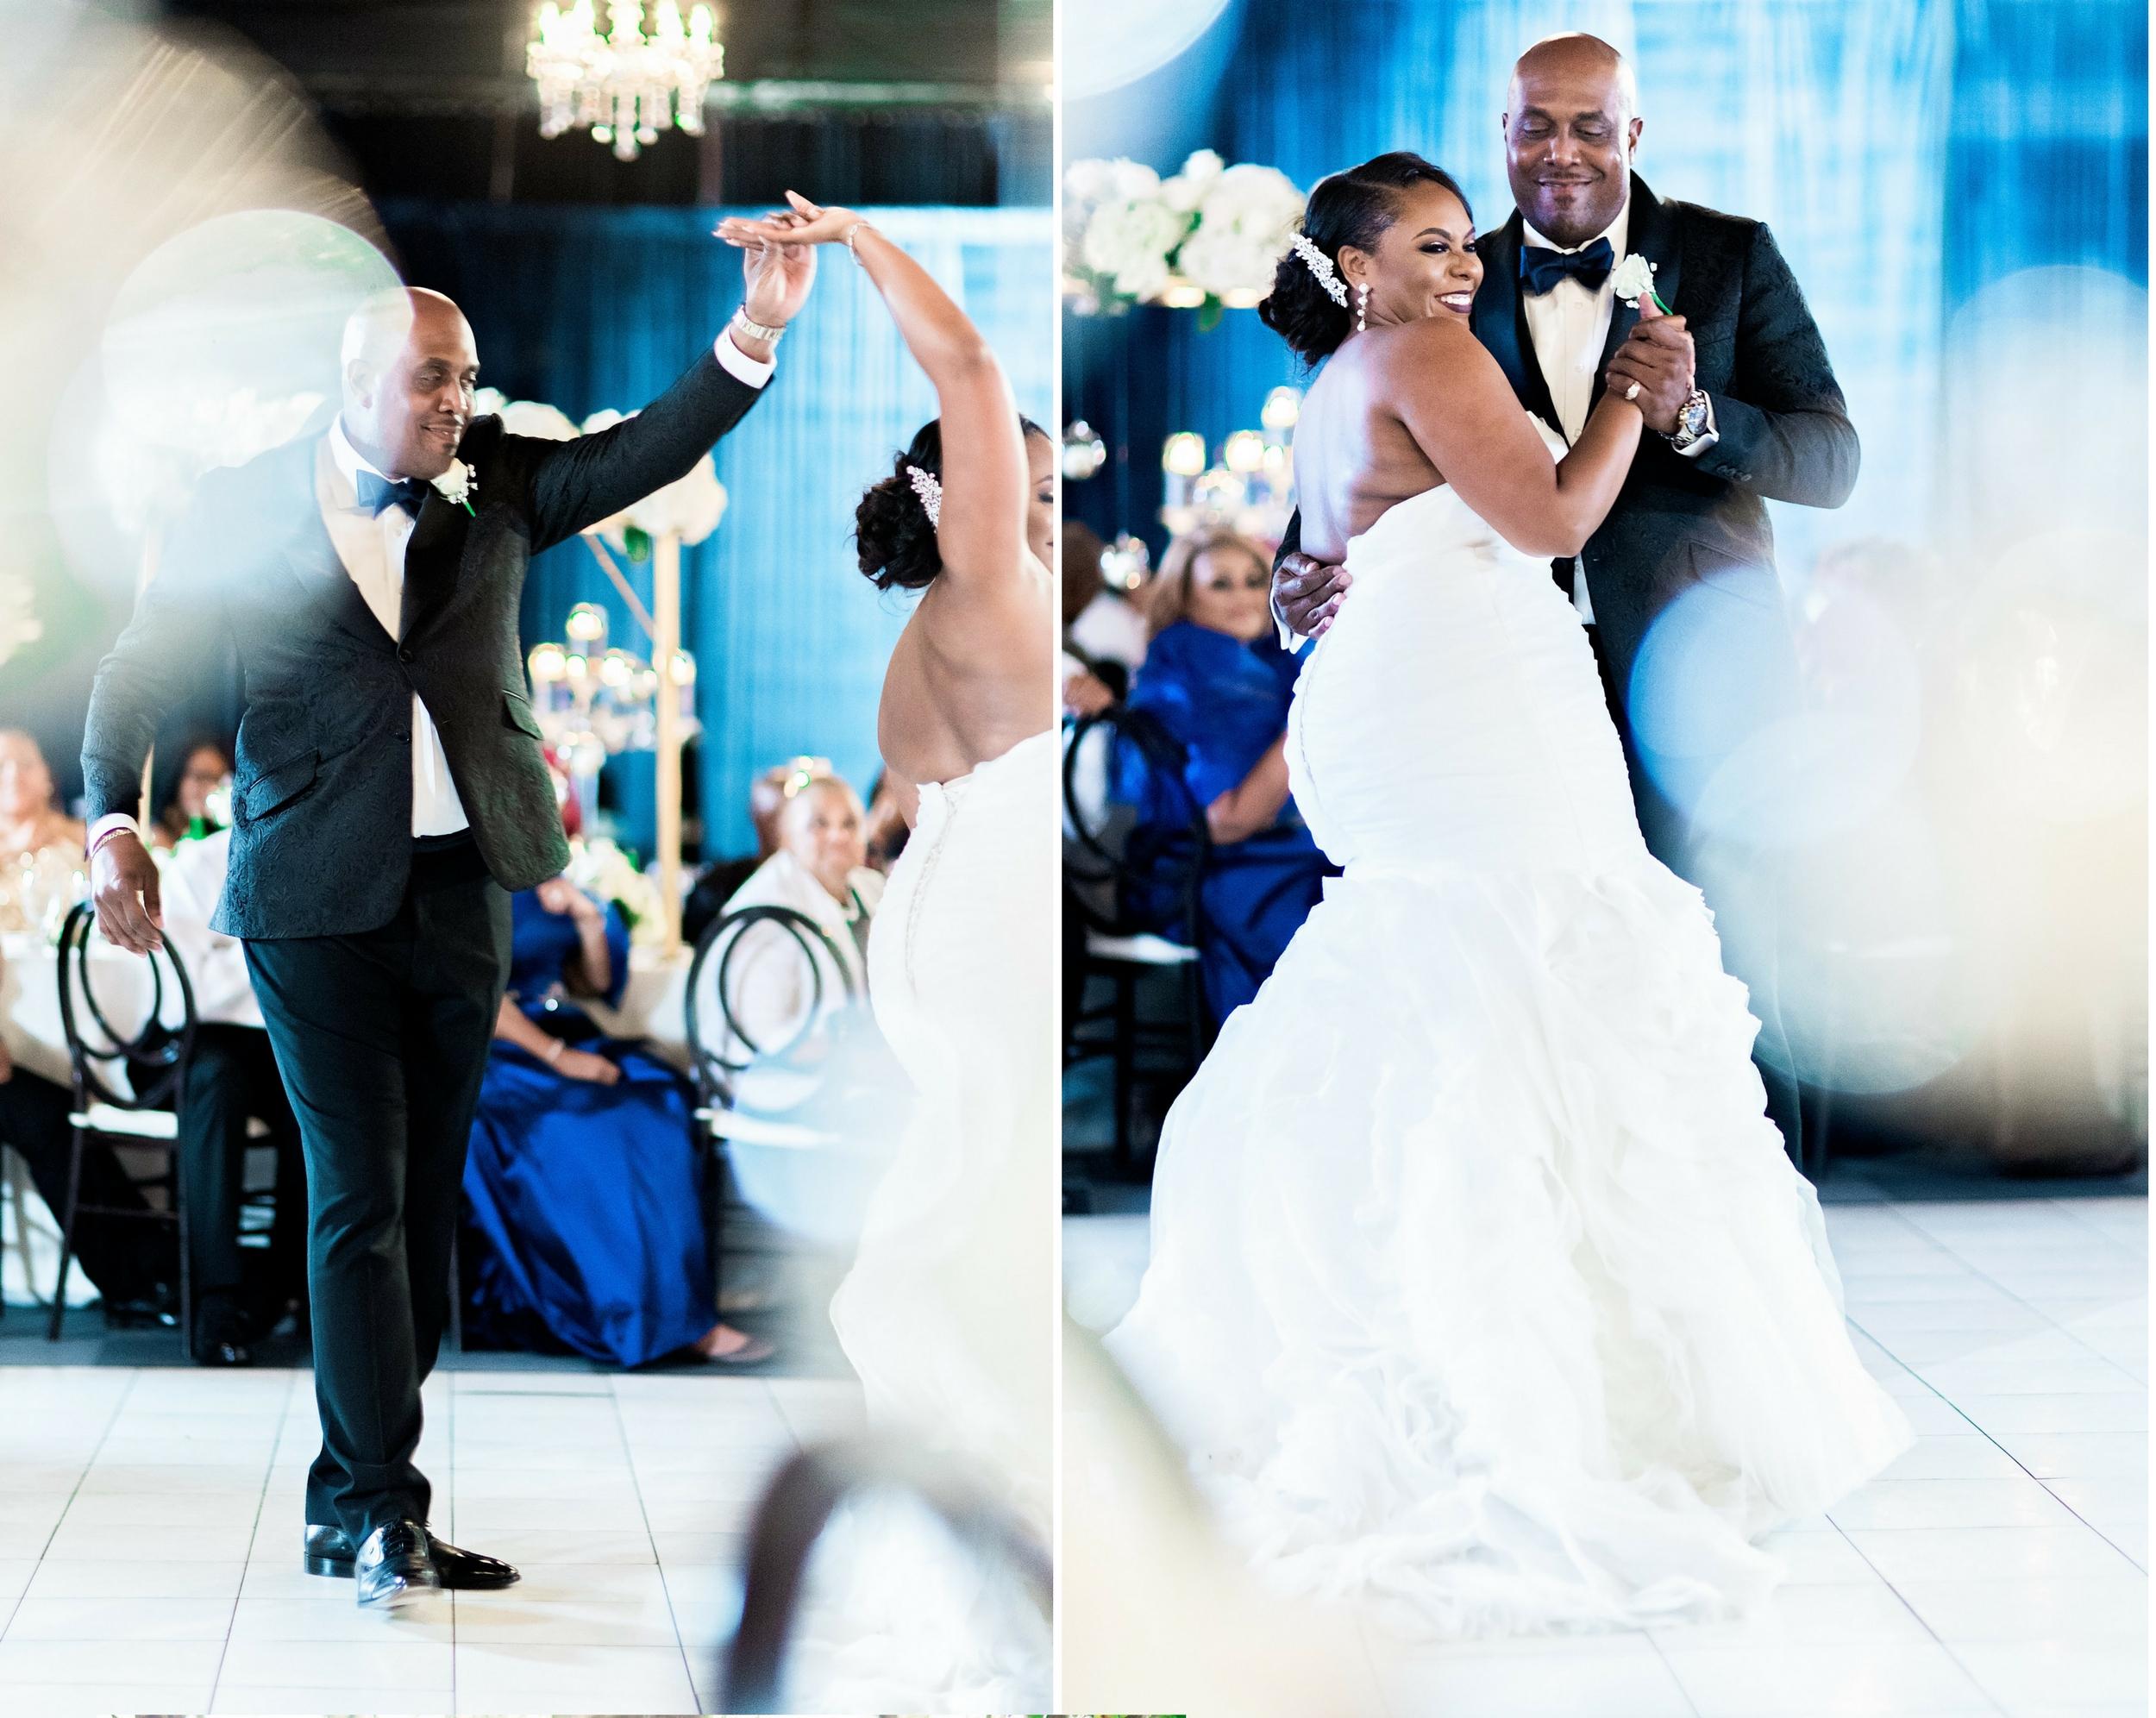 Arlena-Chisom-Wedding-Pharris-Photos 6.jpg